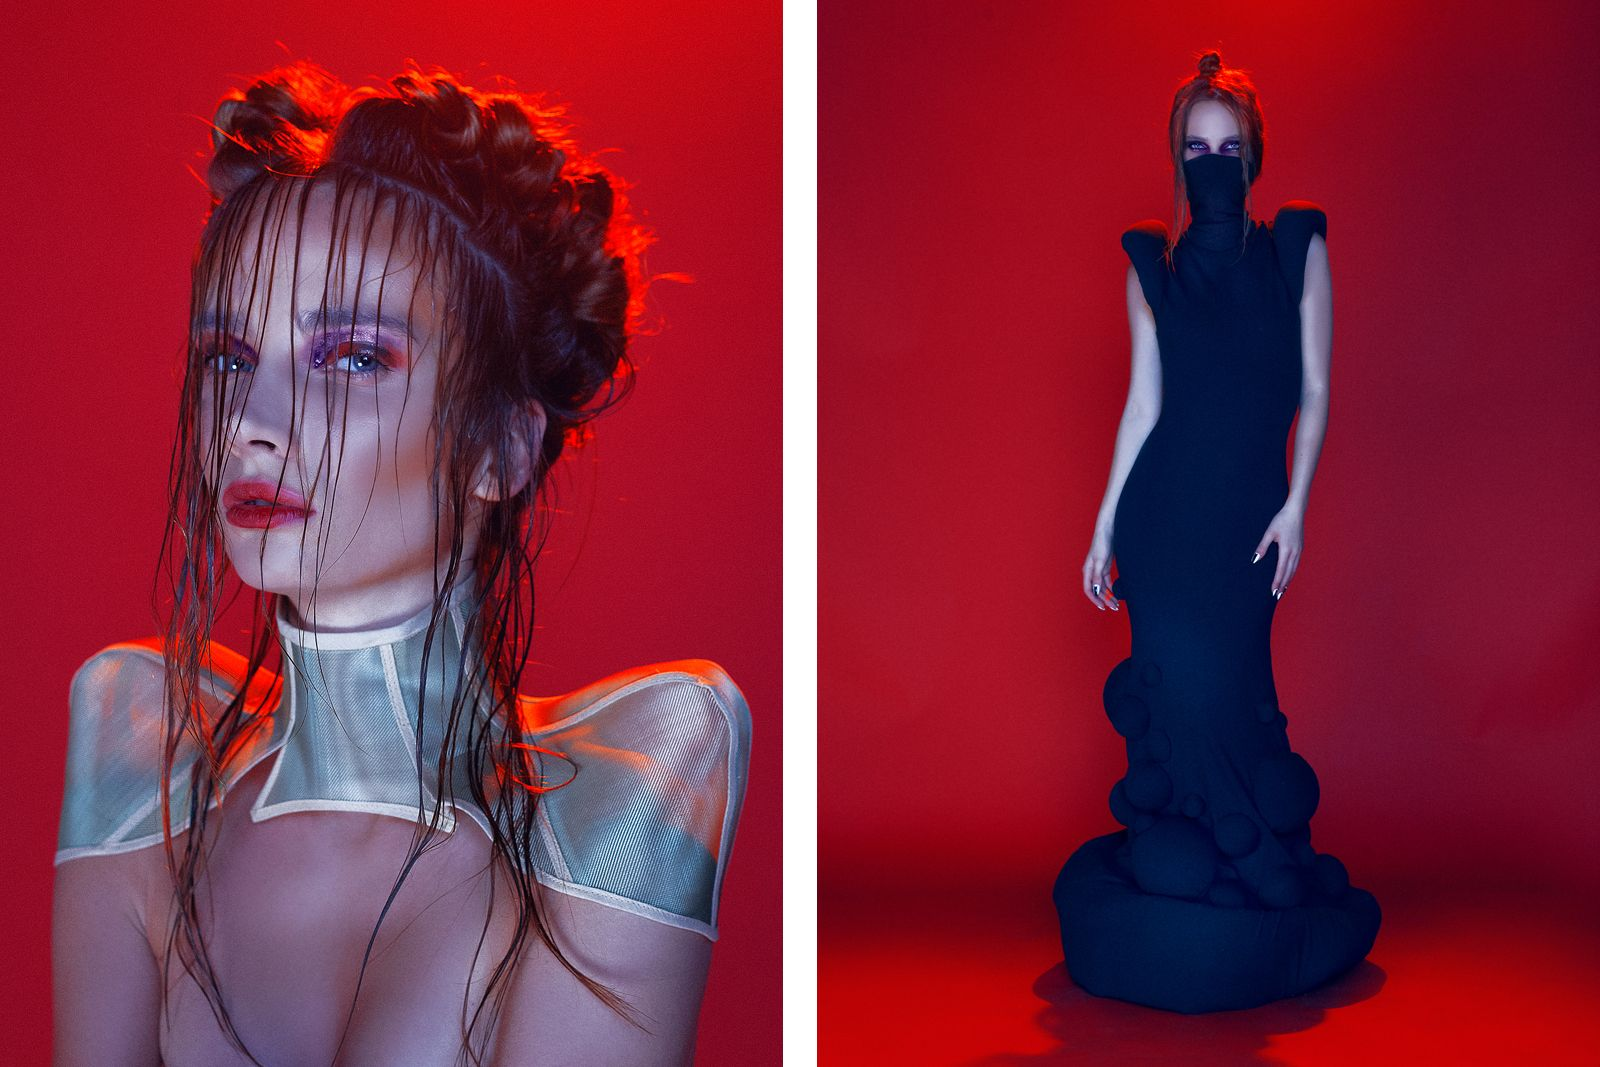 Crimson & Clover Photography- Karla Ticas Styling- Camille Yvette Makeup- Leibi Carias using Chanel